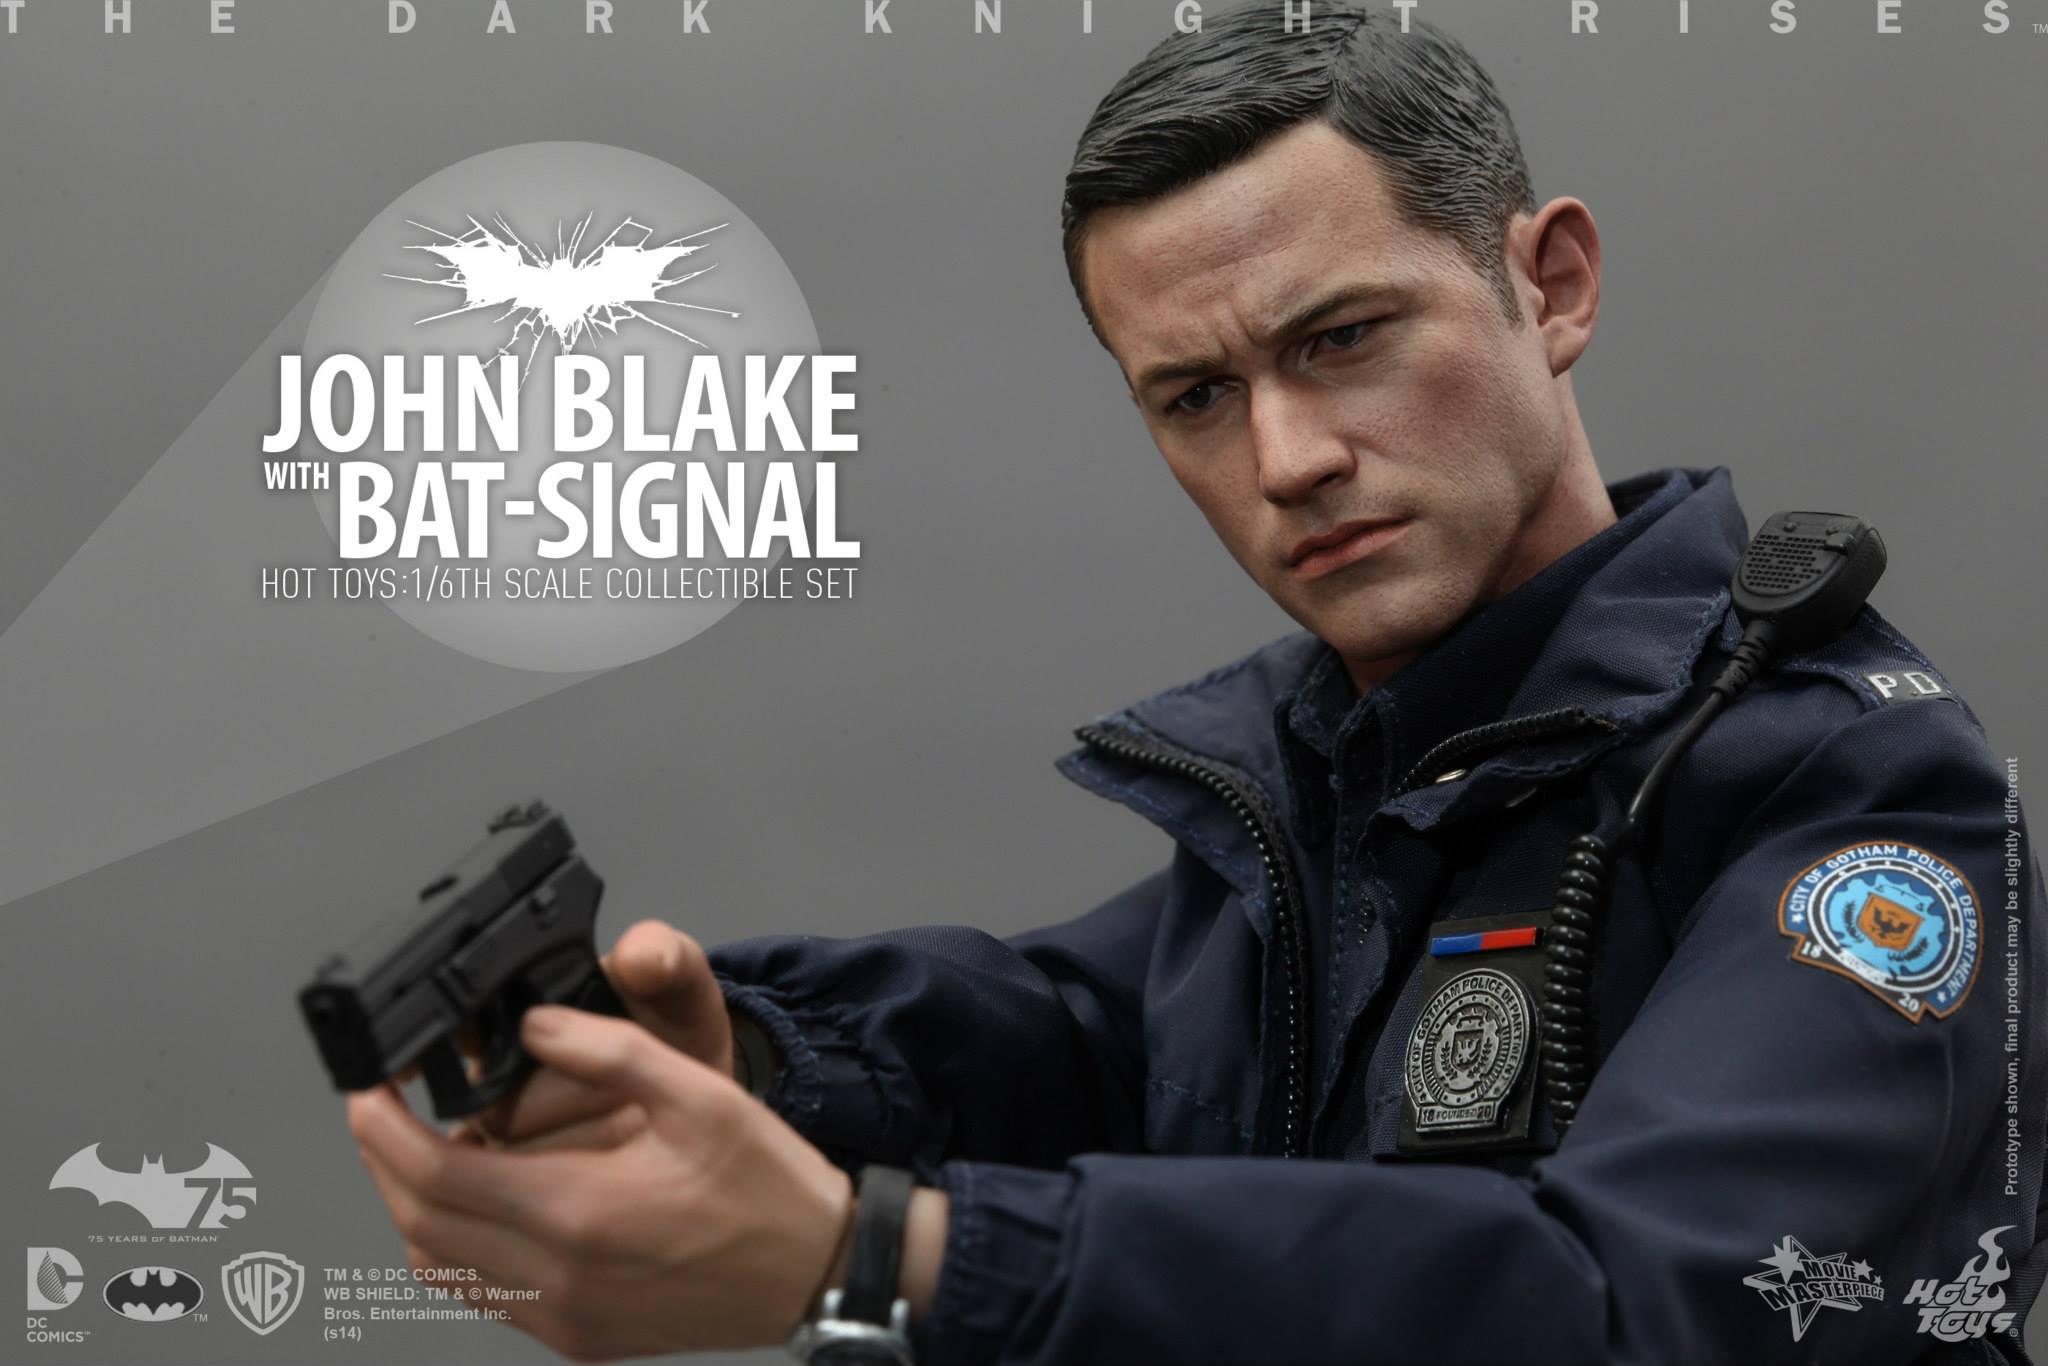 THE DARK KNIGHT RISES - Lt. JIM GORDON & JOHN BLAKE w/BATSIGNAL 280136105